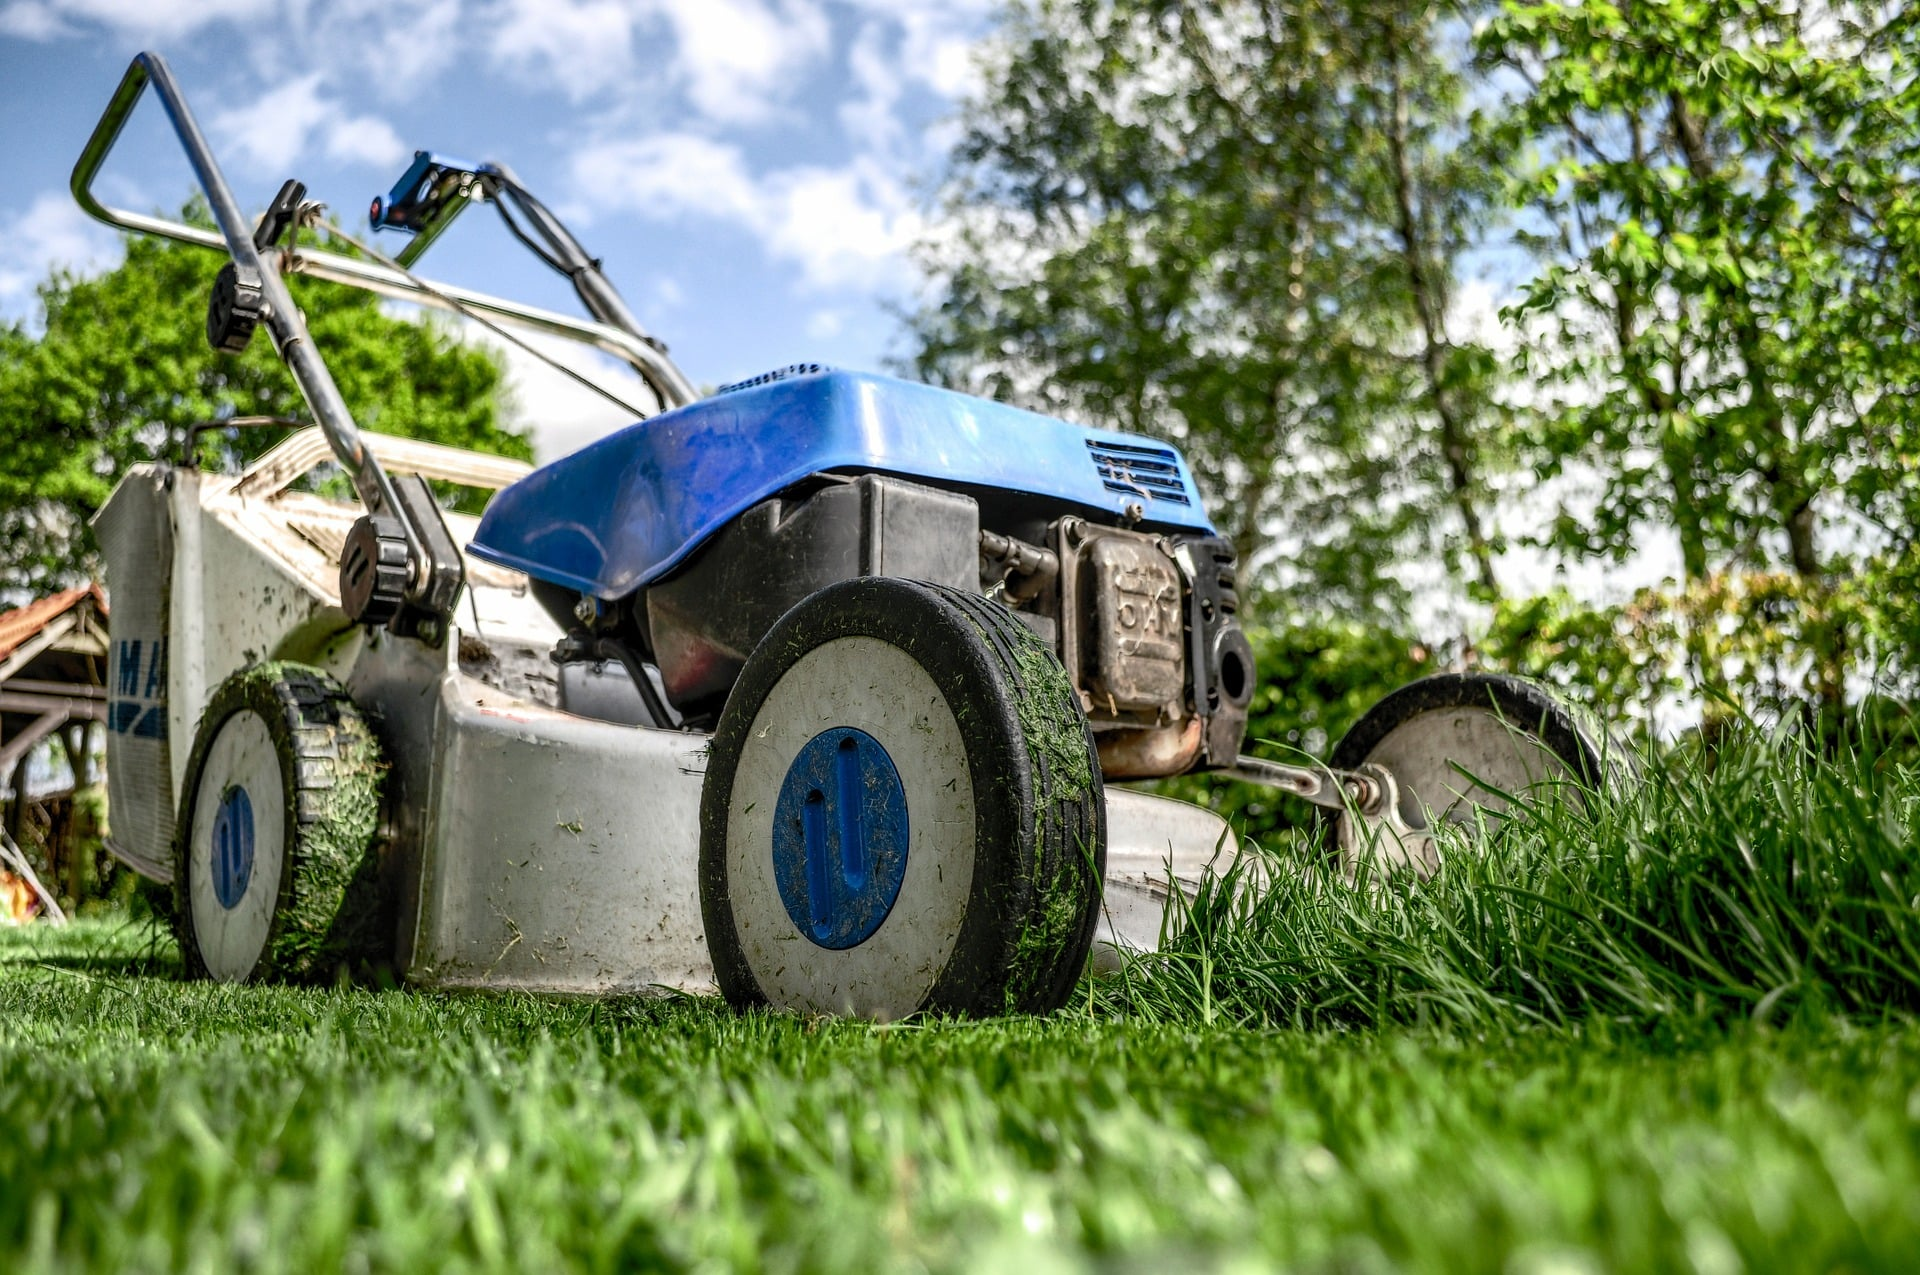 Petrol lawn mower cutting grass.